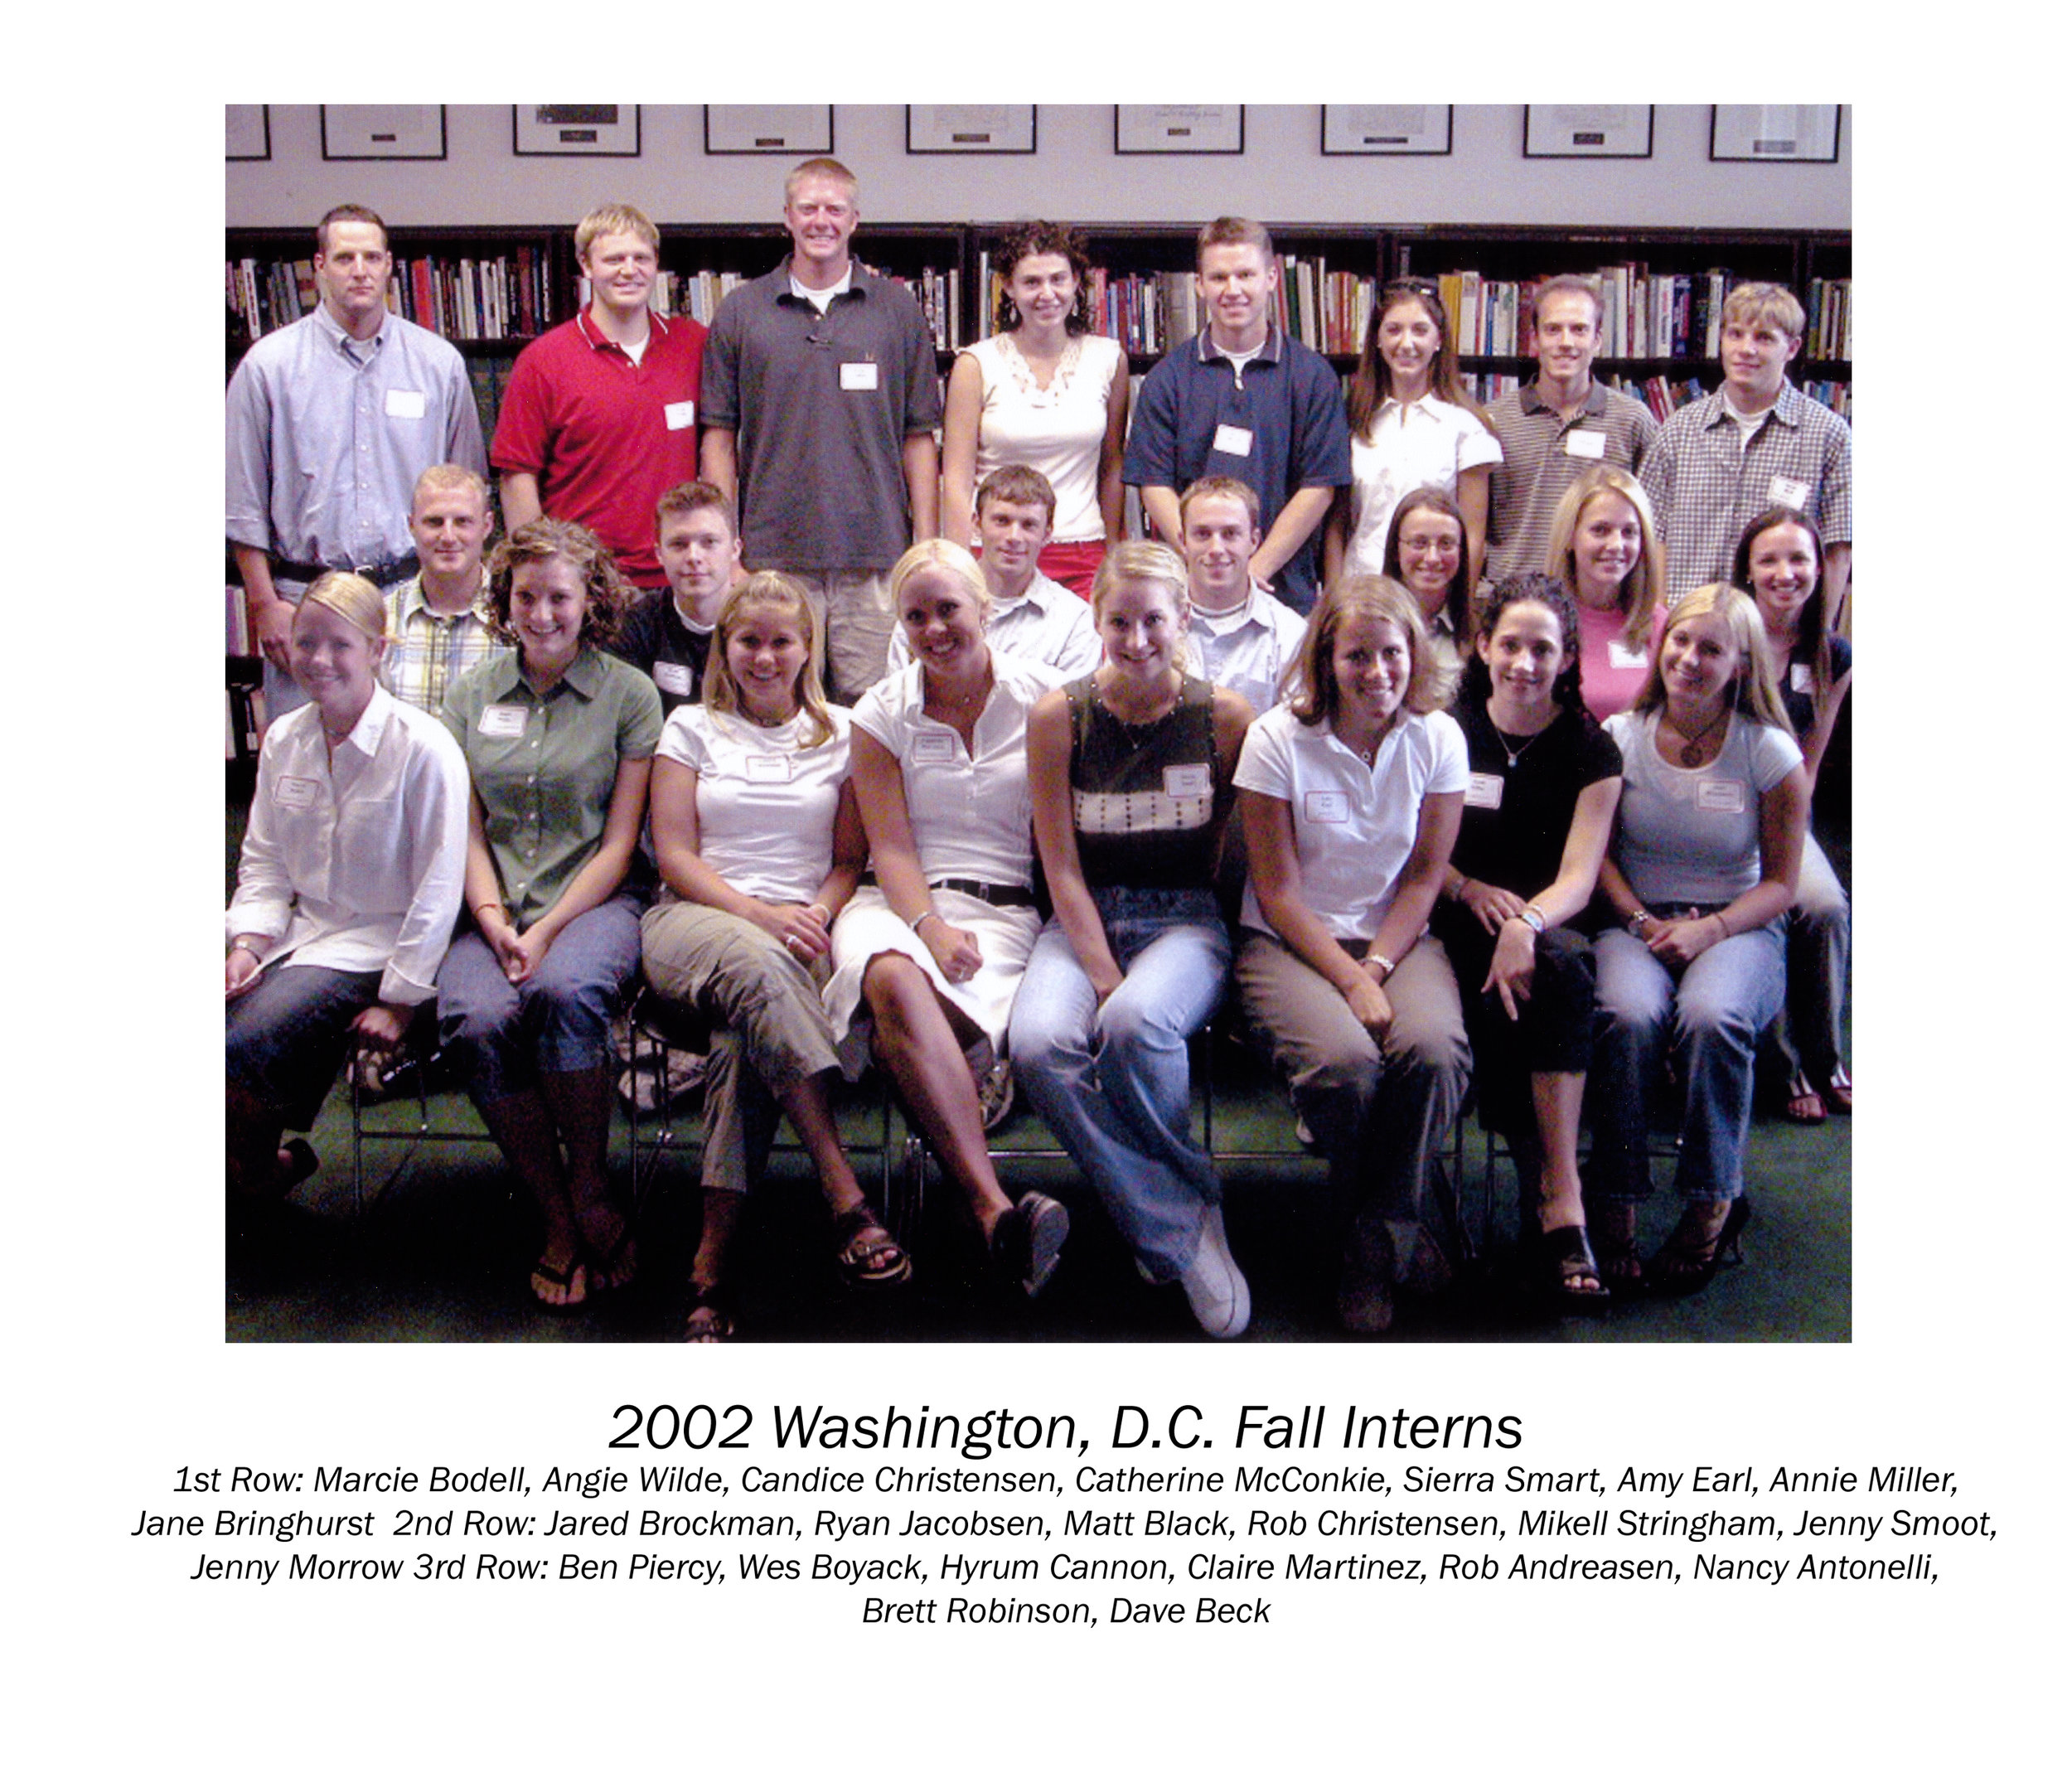 2002 Washington, D.C. Fall Interns copy.jpg